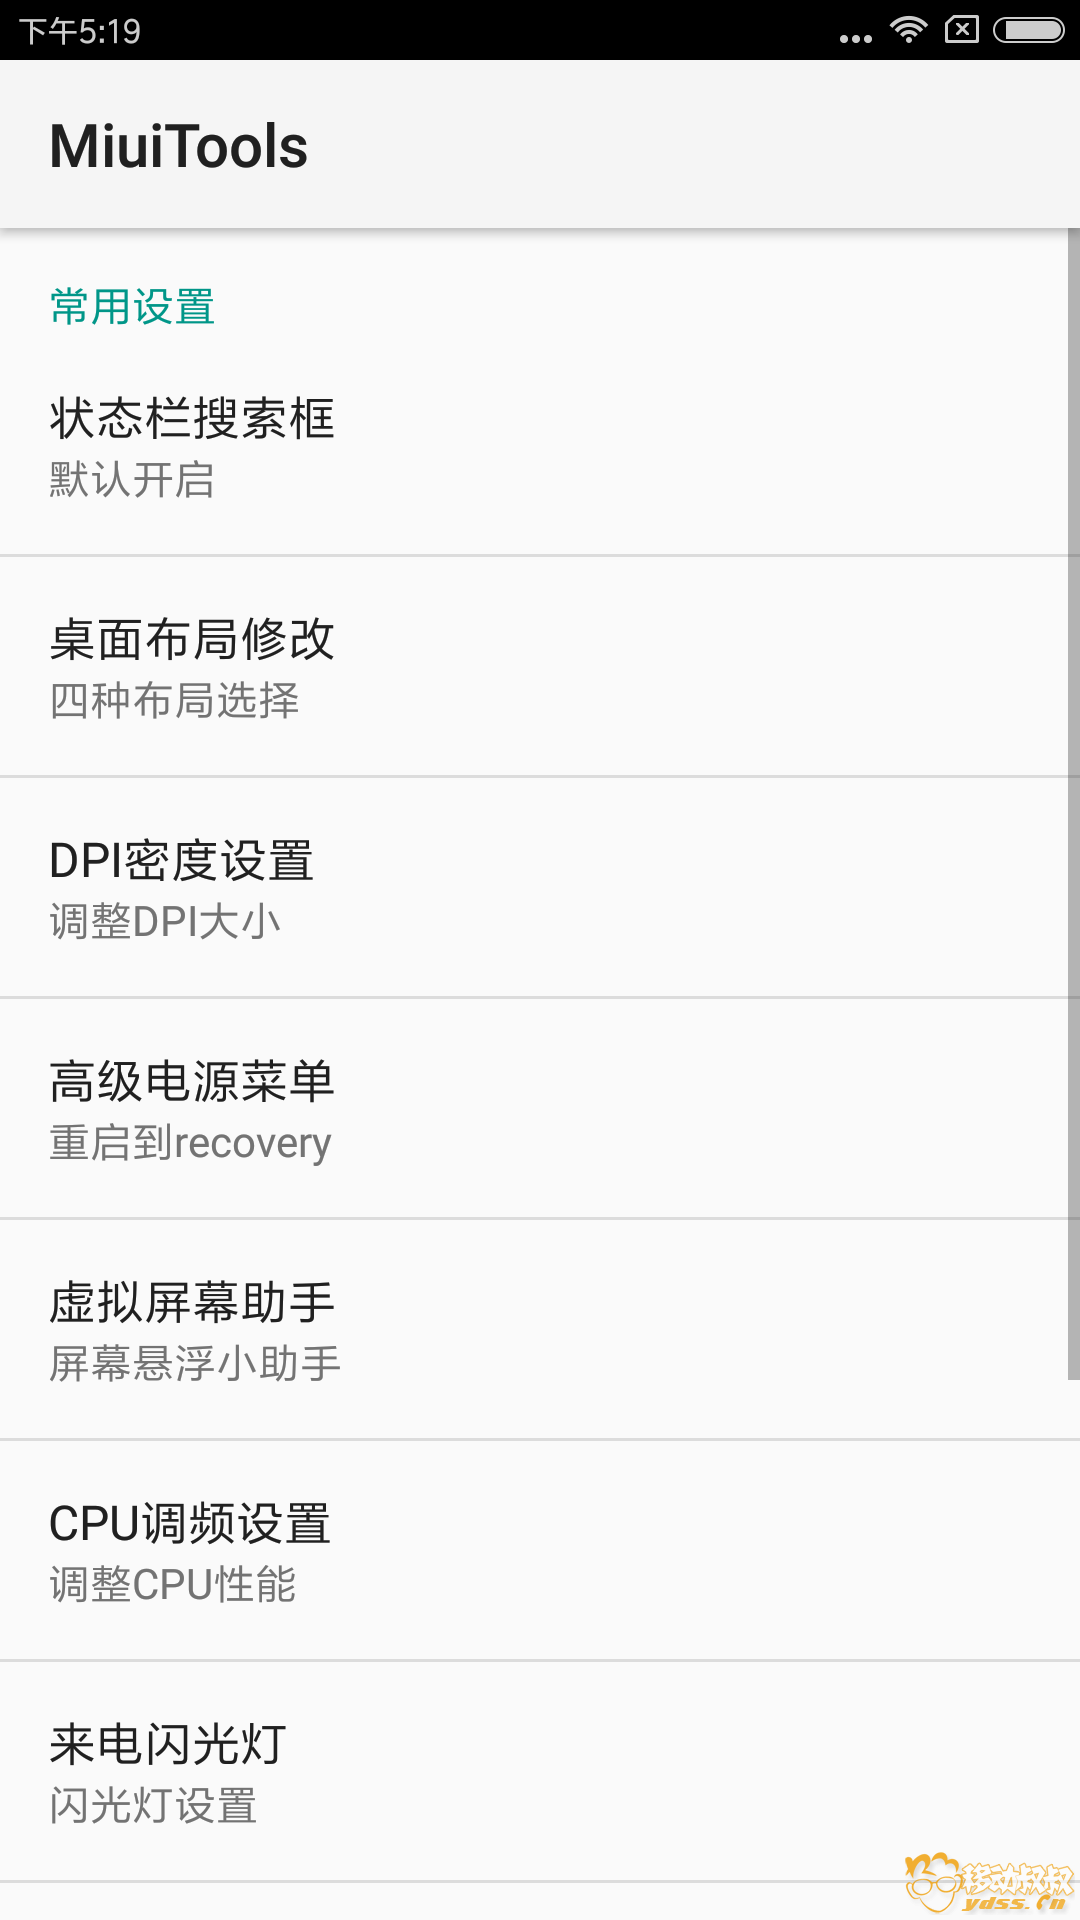 Screenshot_2018-03-24-17-19-01-044_com.anzhi.hwsettings.png